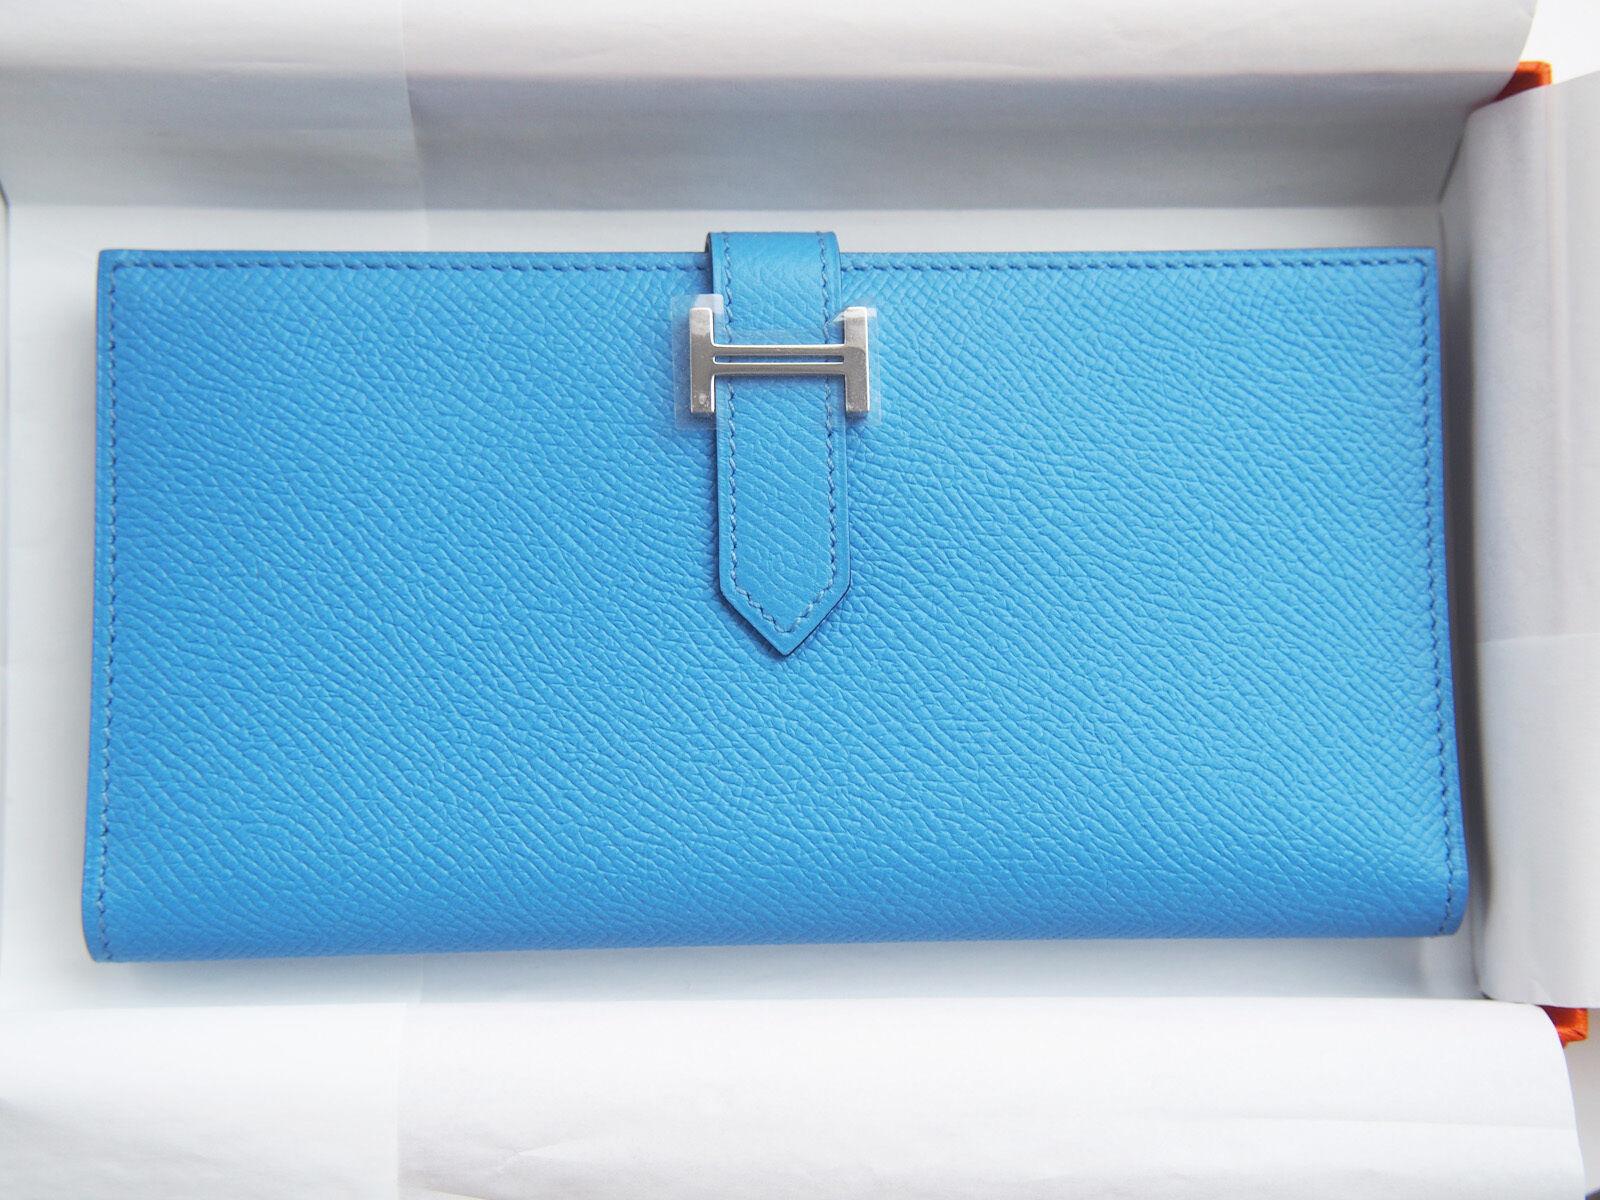 LOVELY Authentic NEW Hermes Bearn H Wallet BLUE Paradise Epsom leather PHW